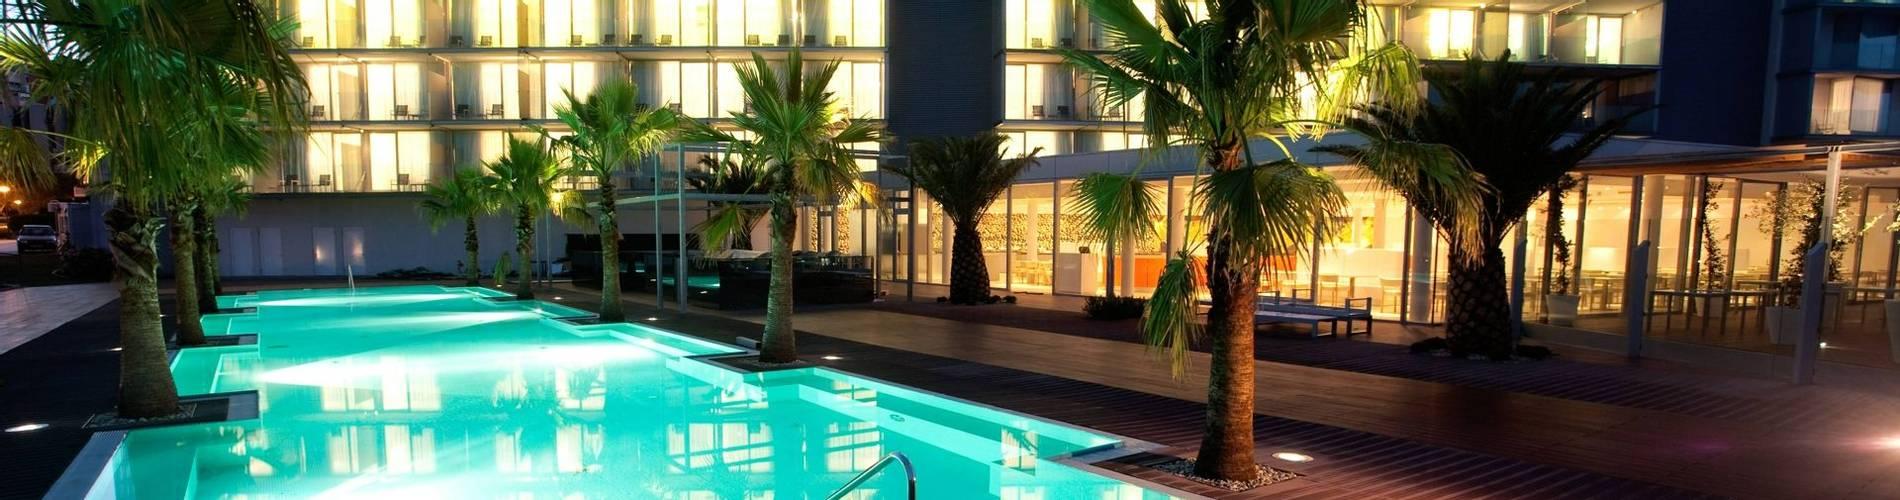 01.08.2010. Split, Hotel Radisson Blu.